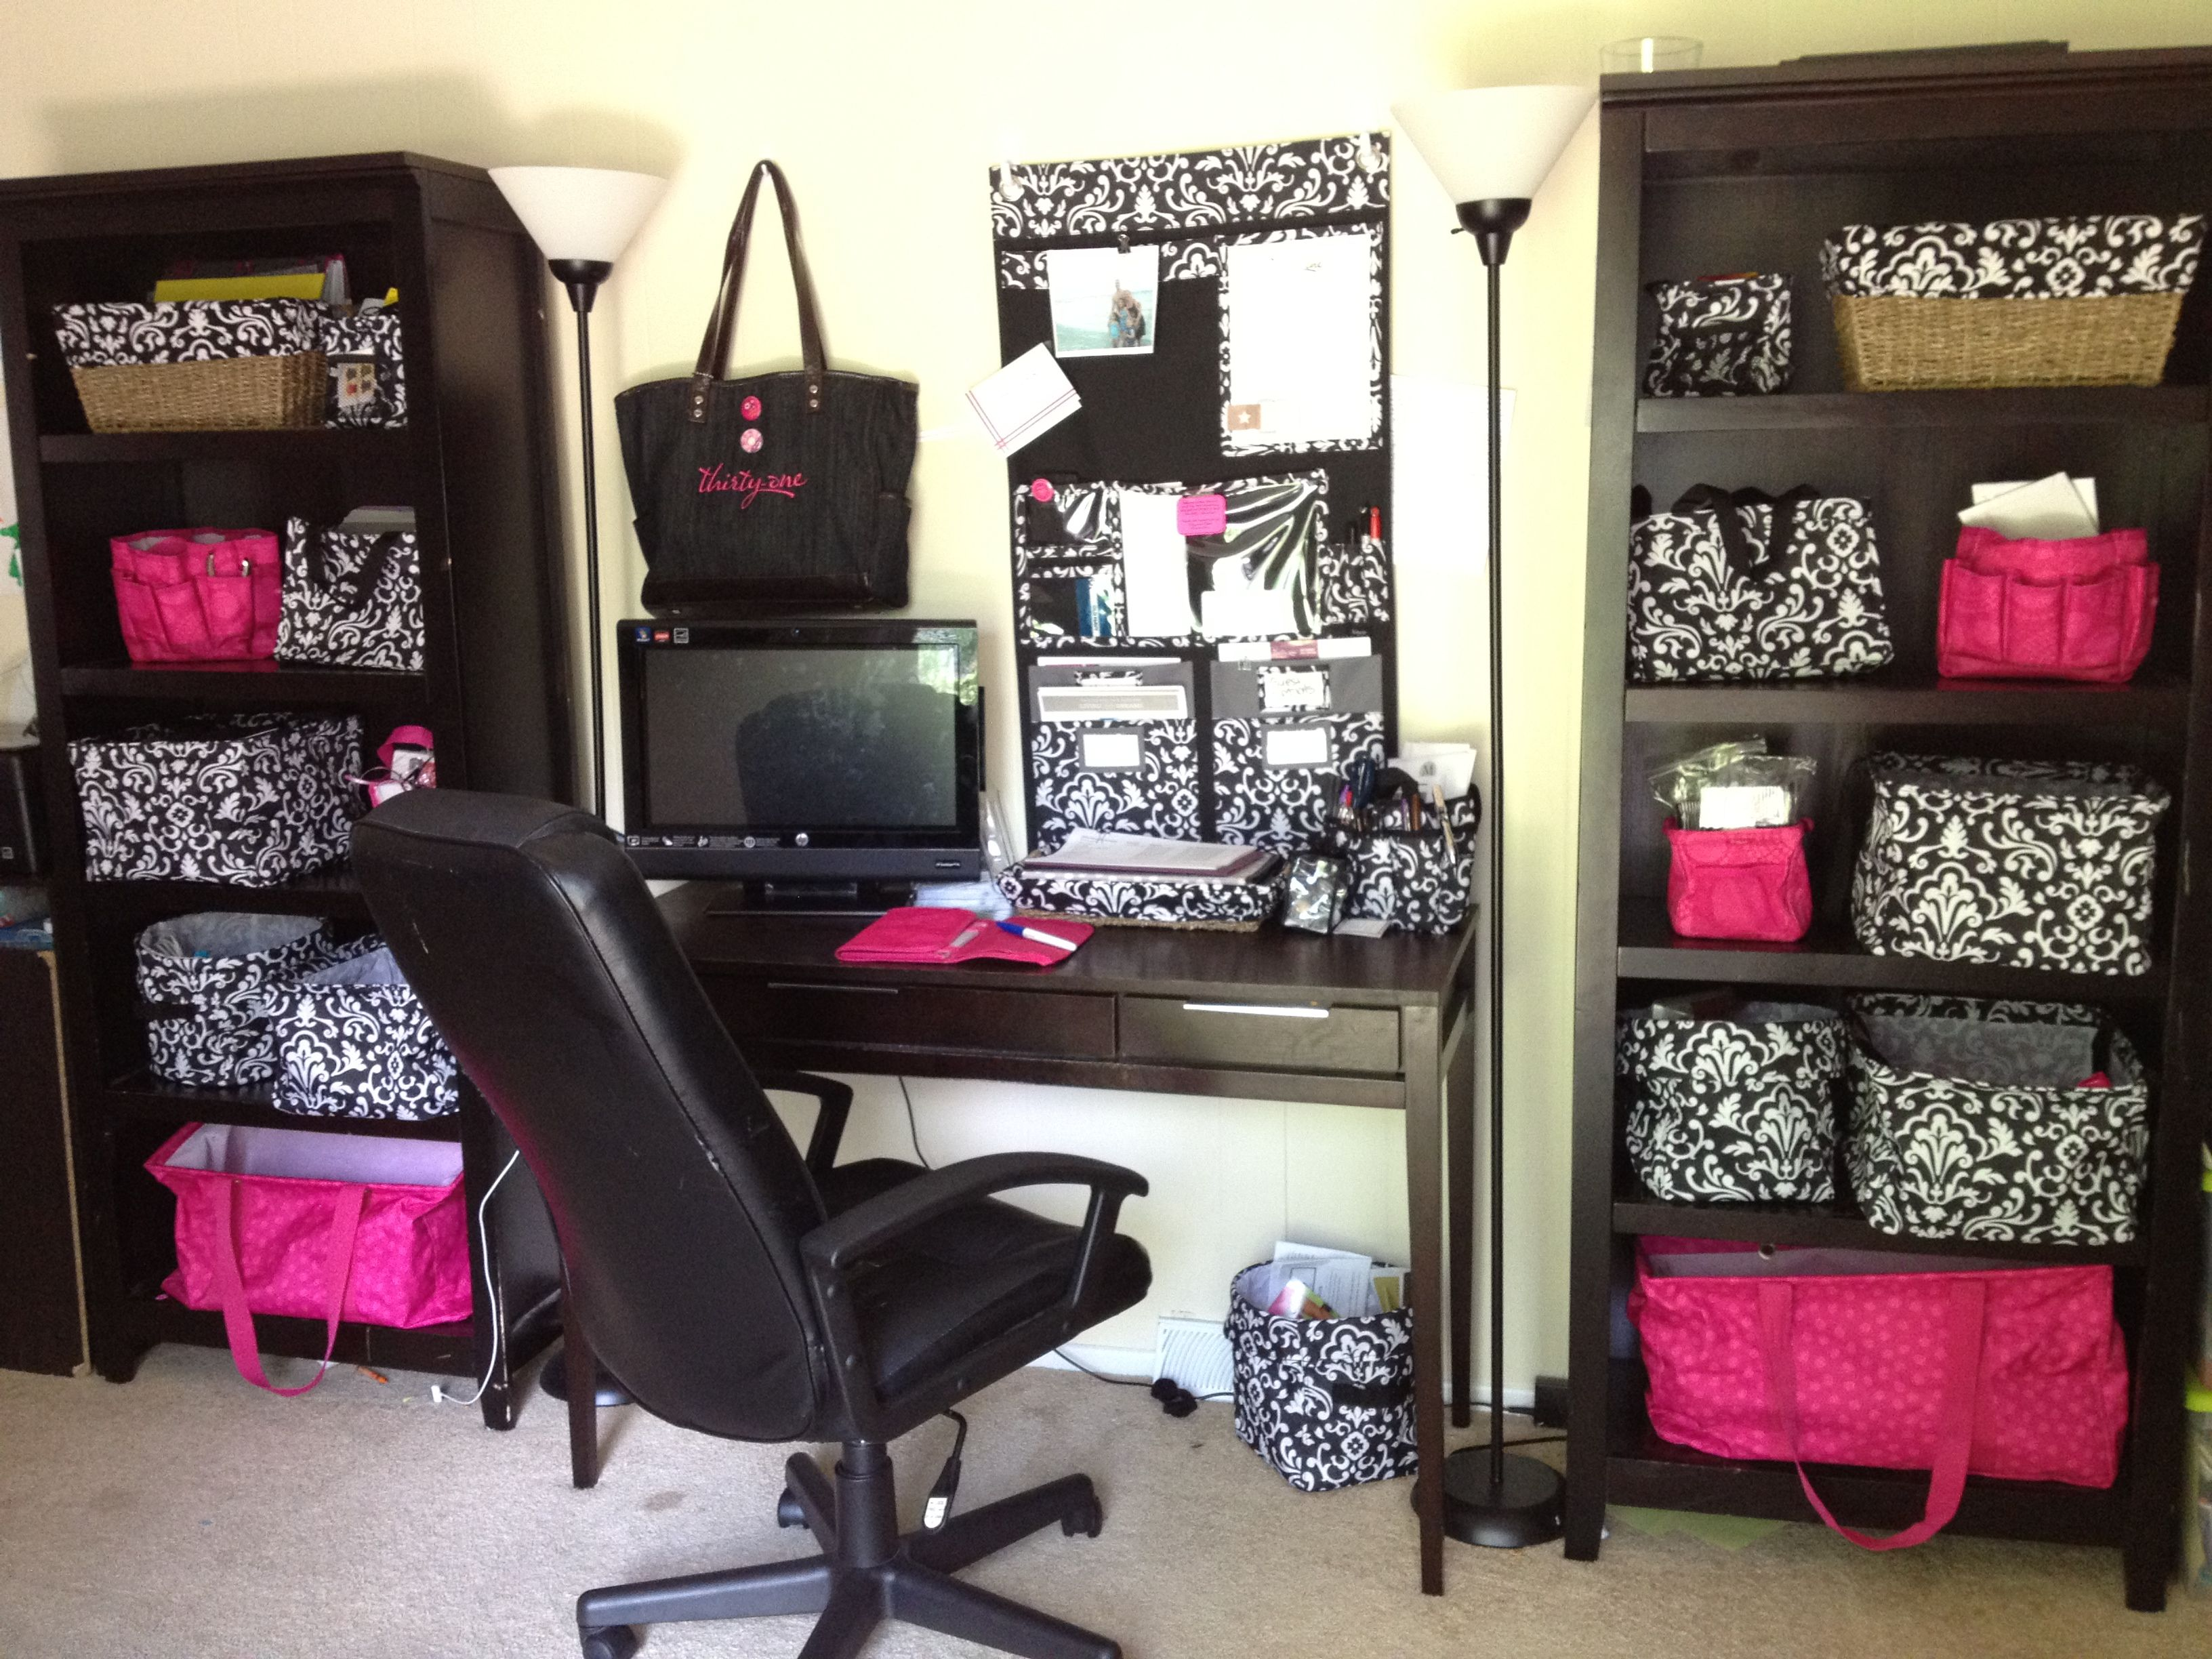 Thirtyone home office organized with thirtyone craft room ideas